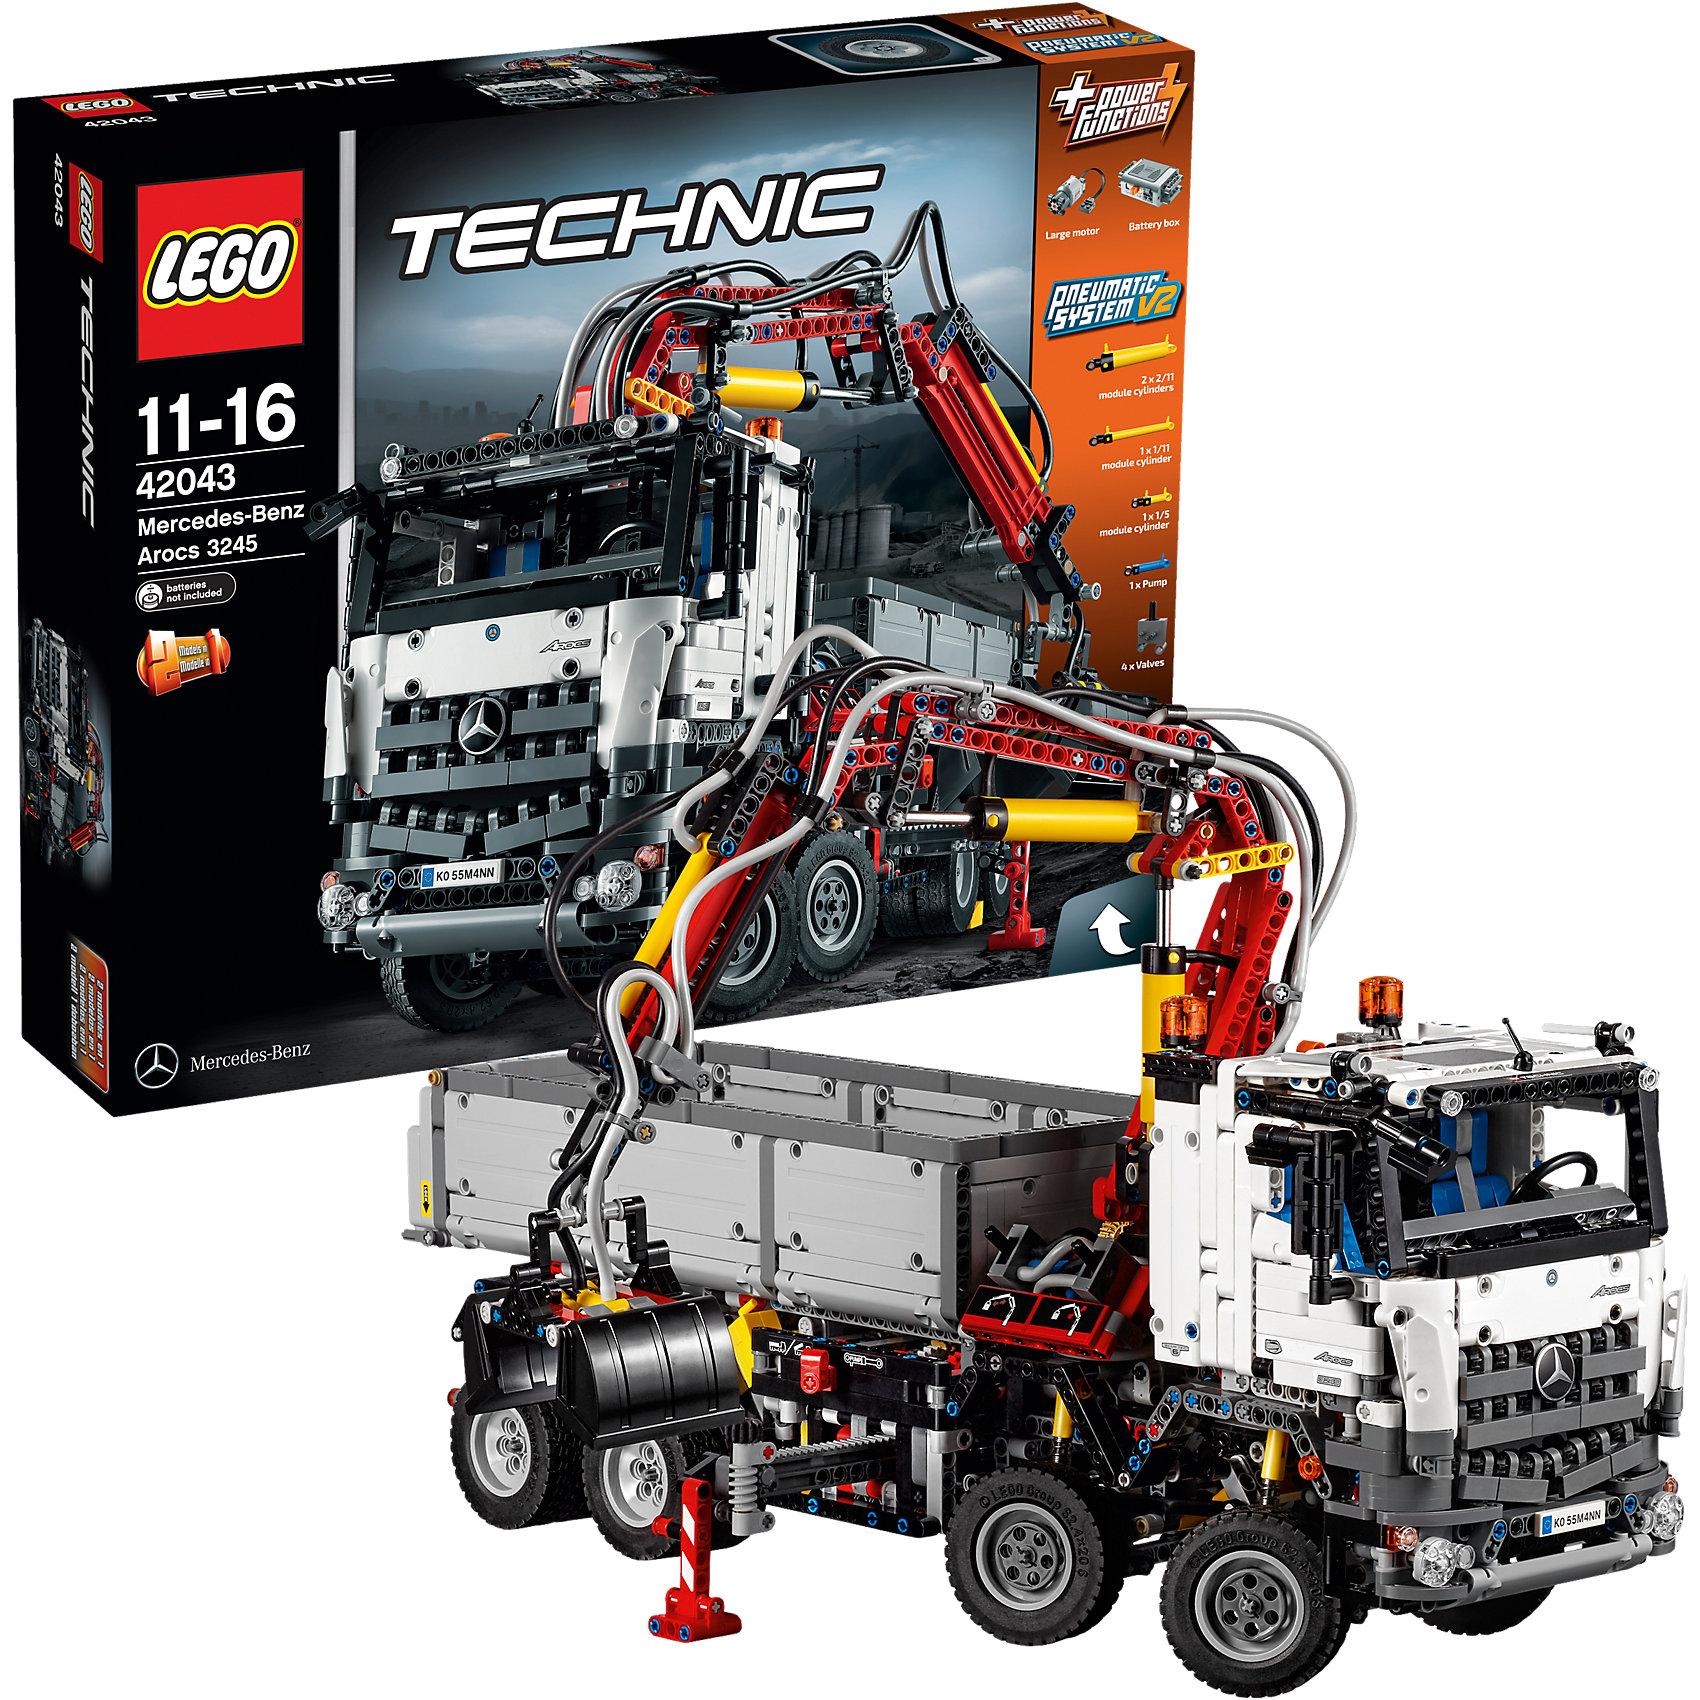 LEGO Technic 42043: Mercedes-Benz Arocs 3245